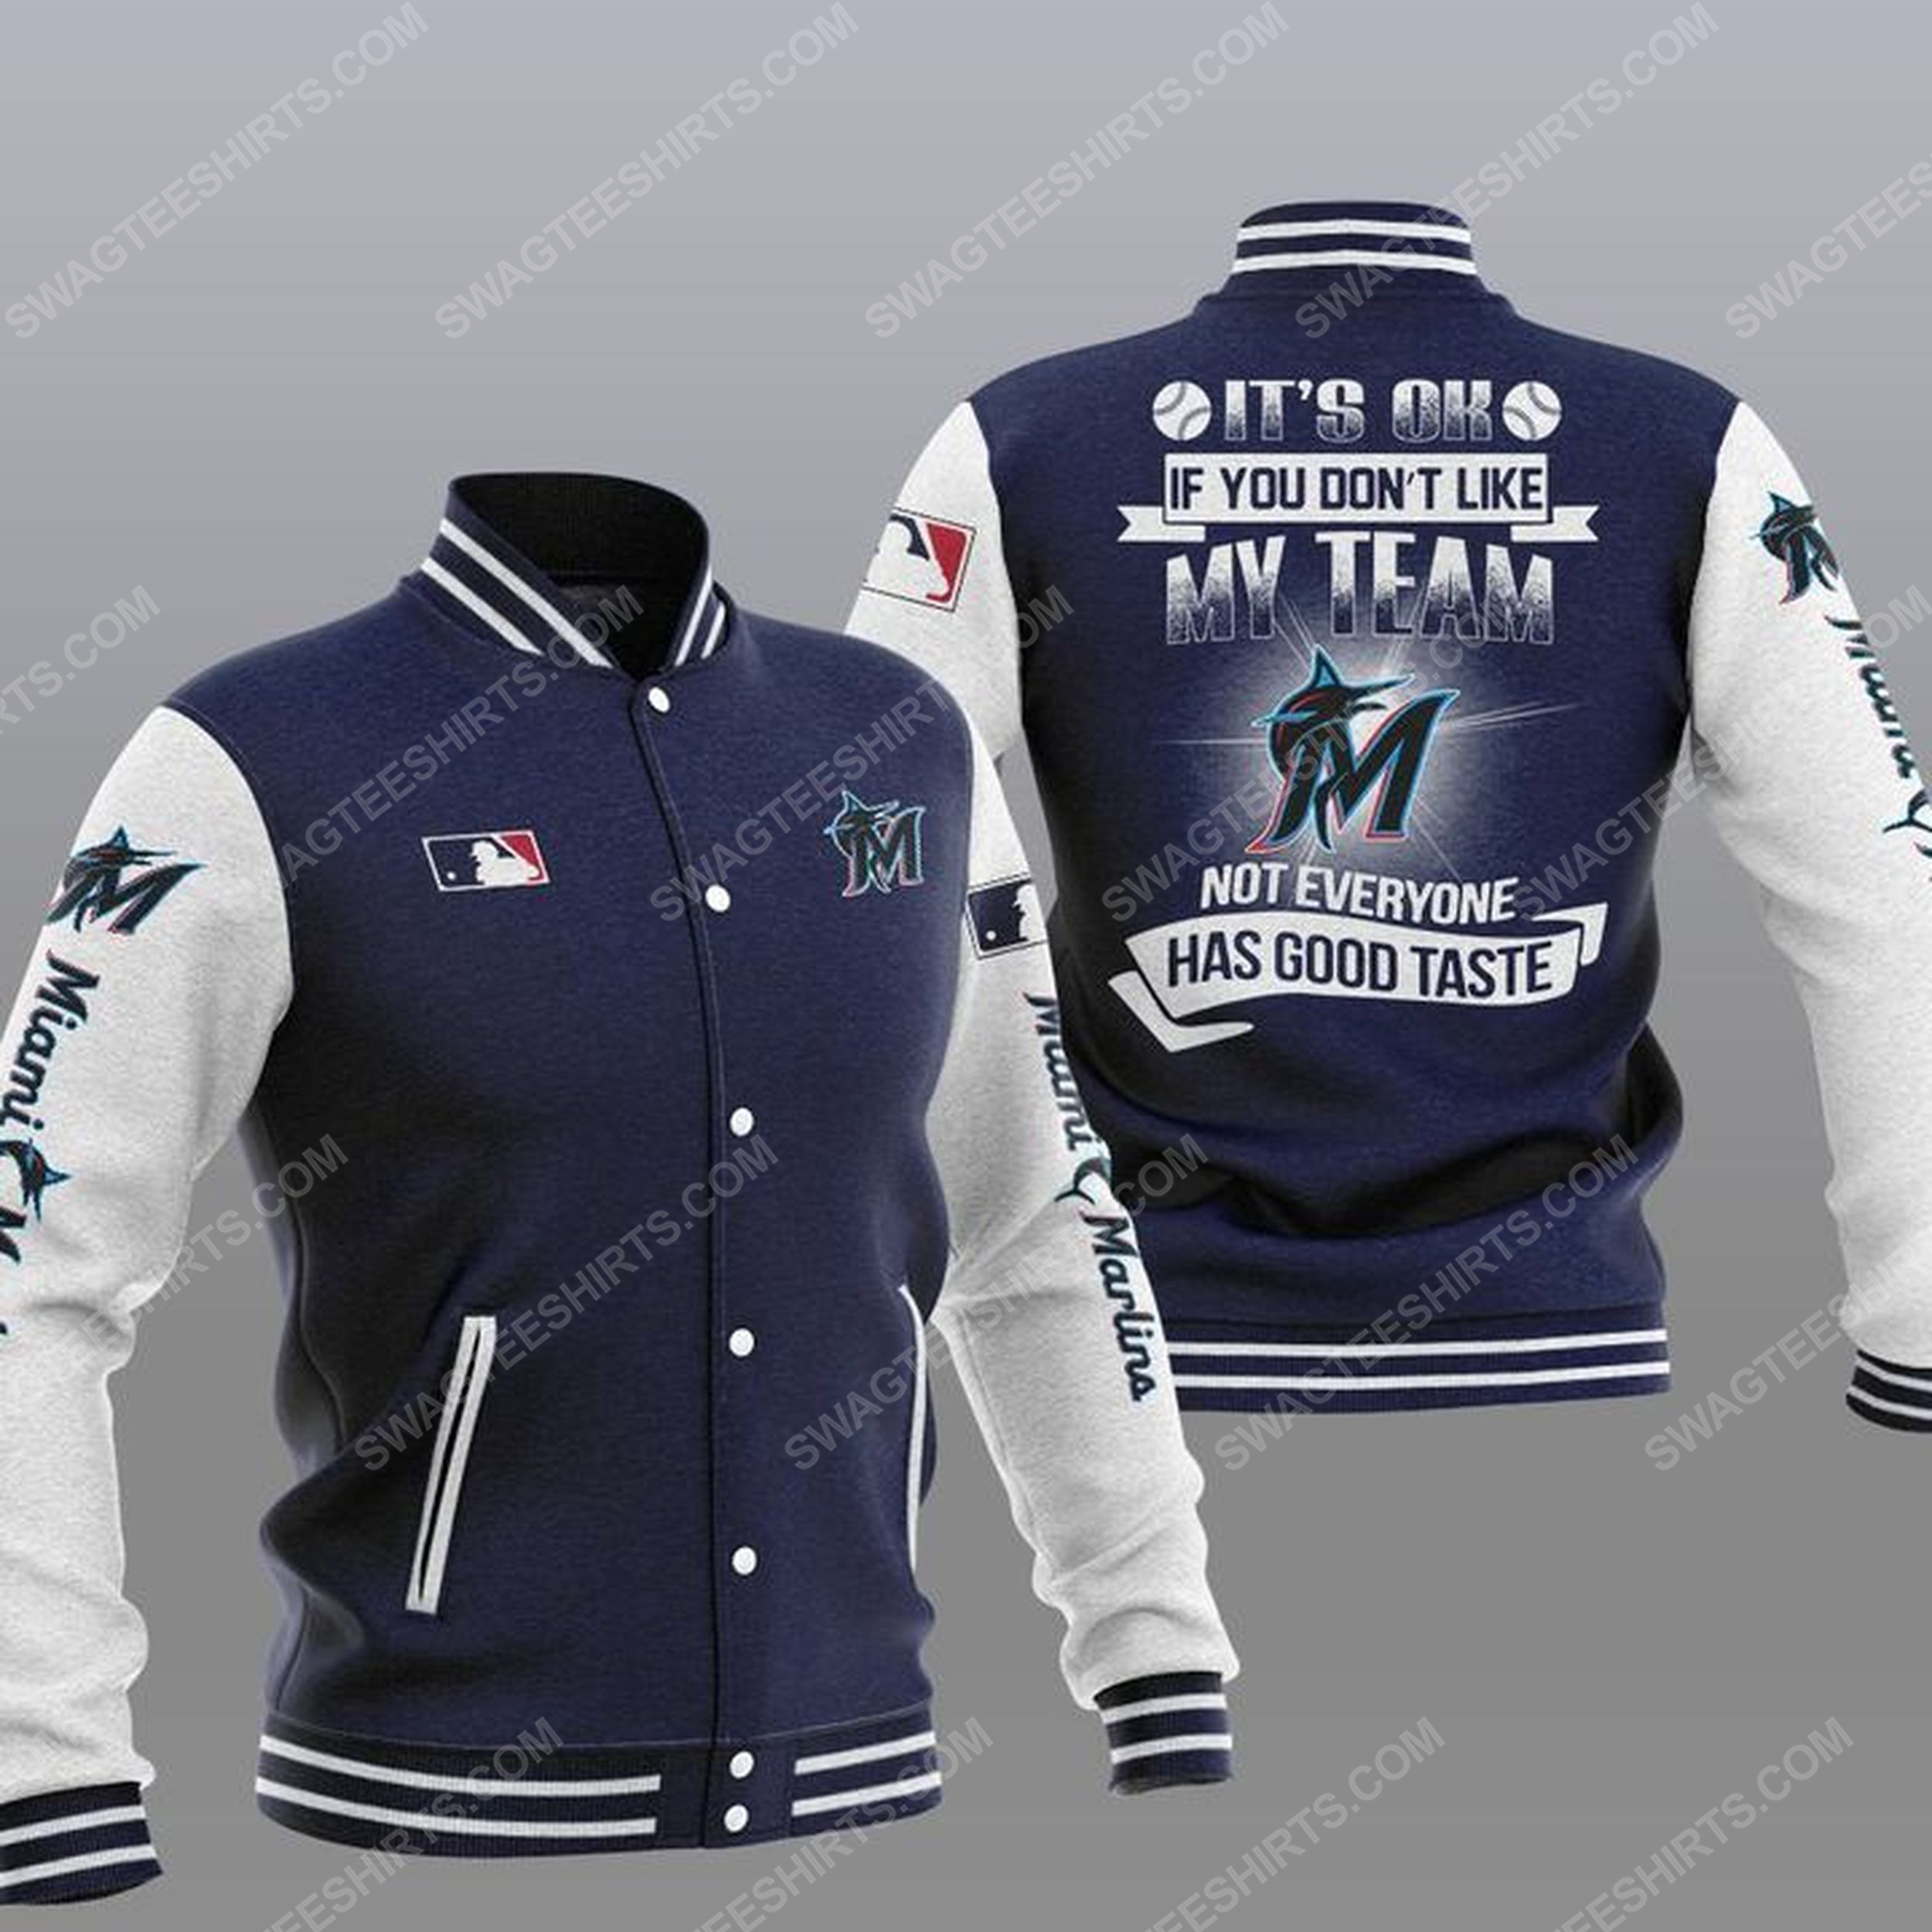 The miami marlins mlb all over print baseball jacket - navy 1